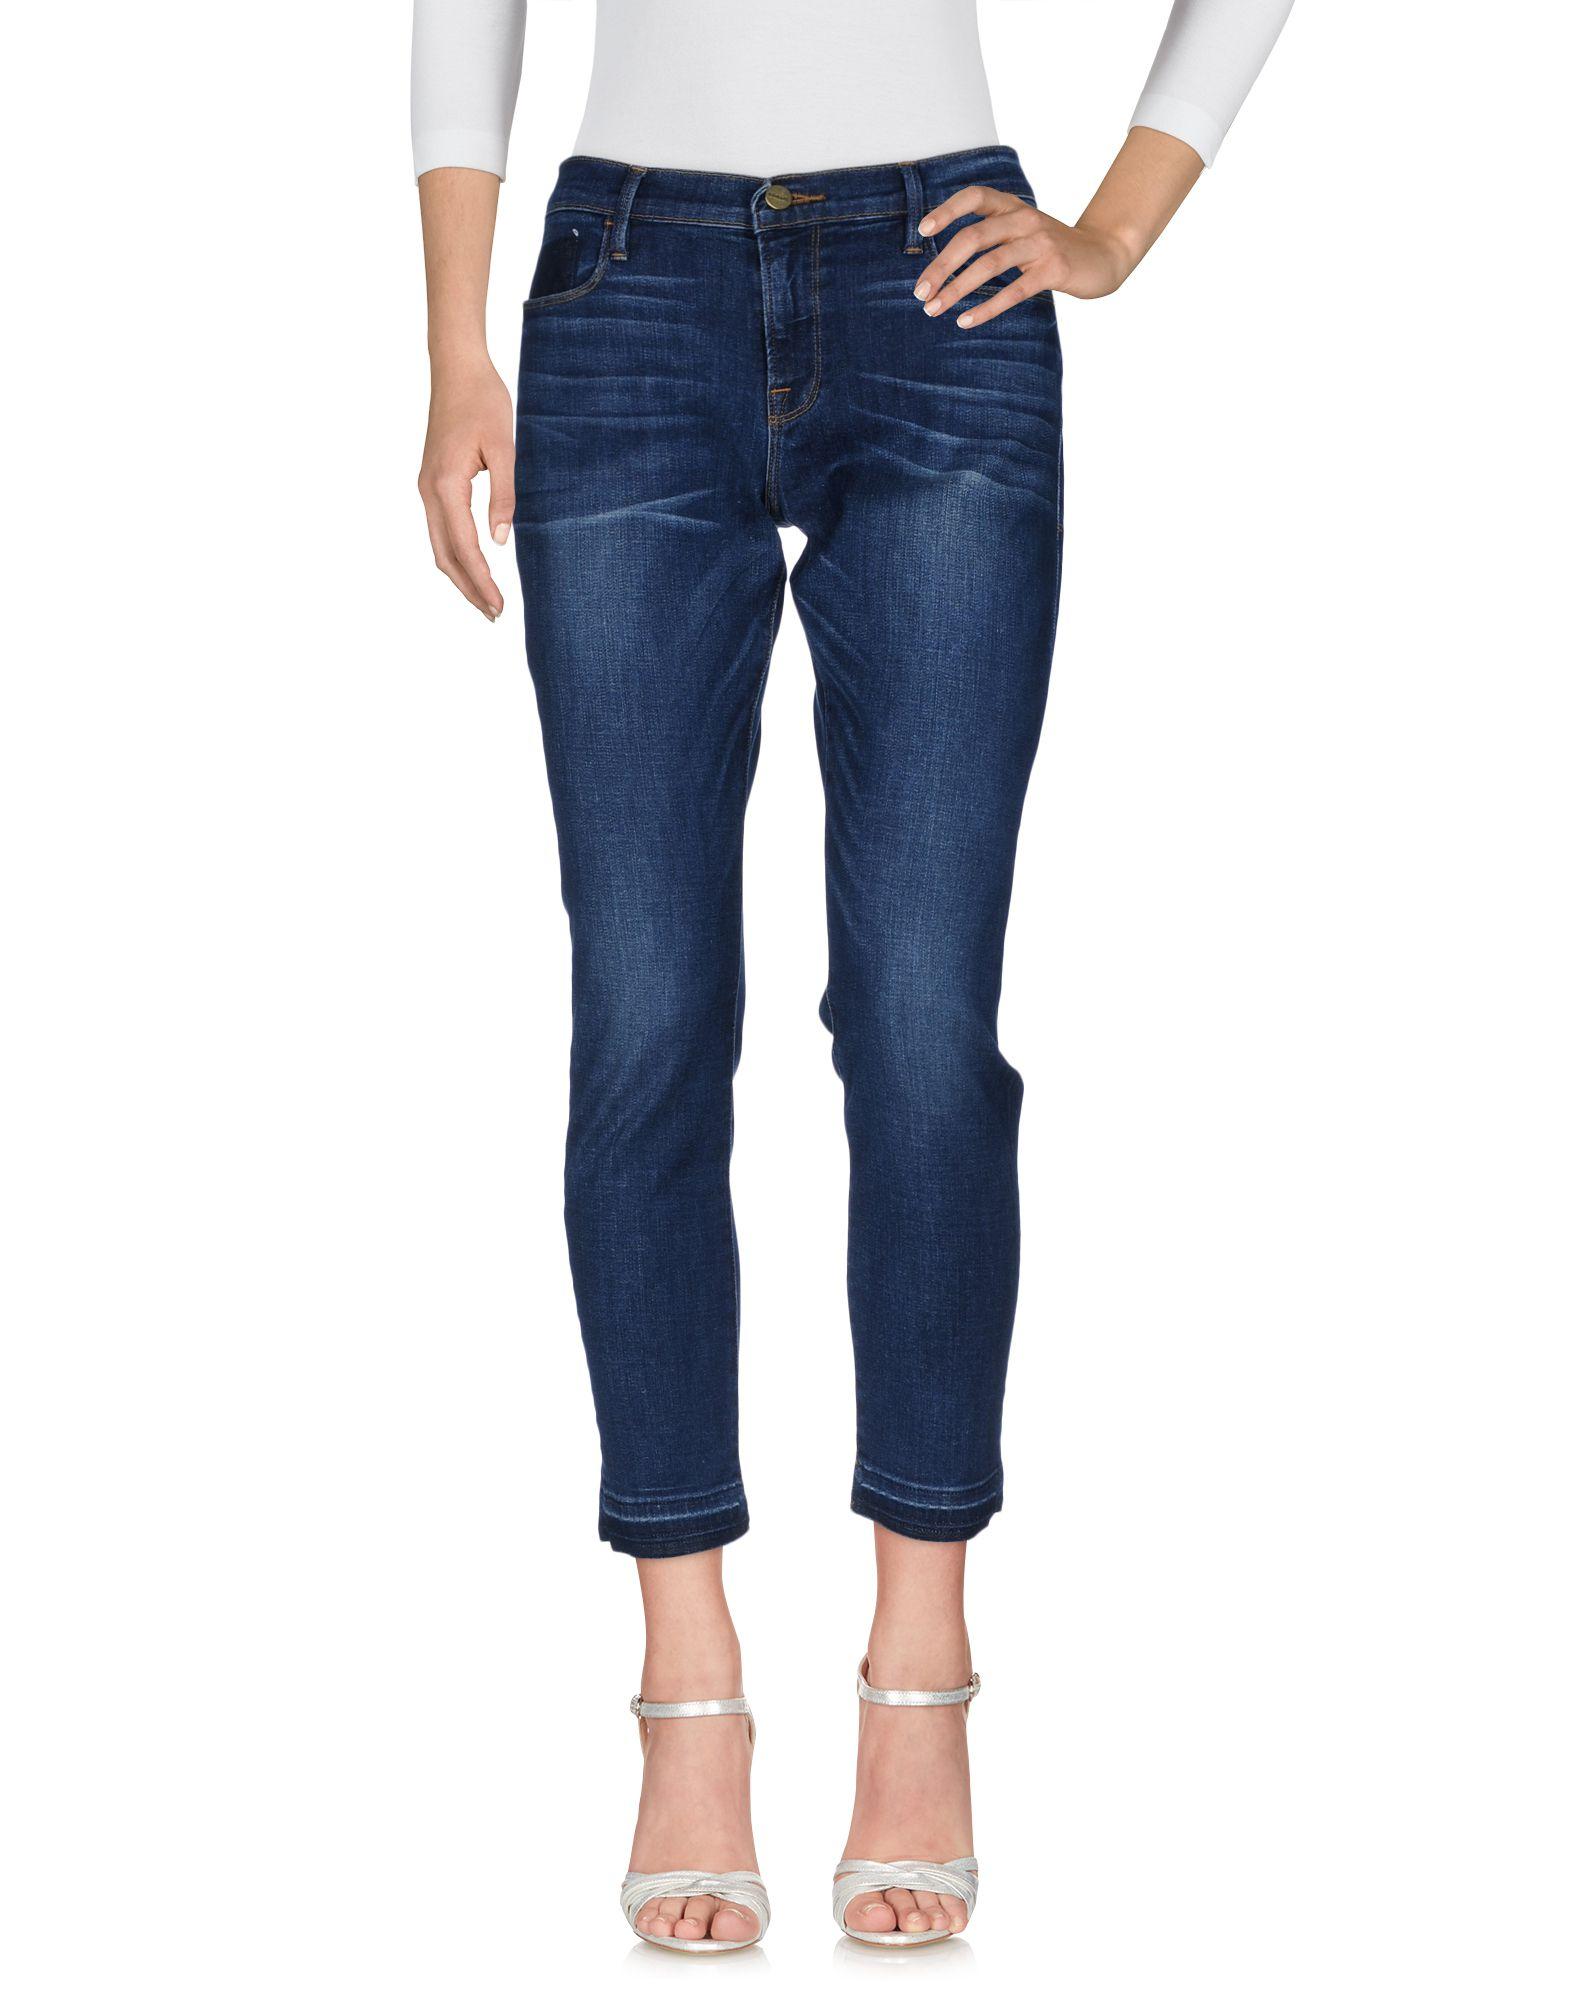 Pantaloni Jeans Frame Donna - Acquista online su uRSYUTS2e